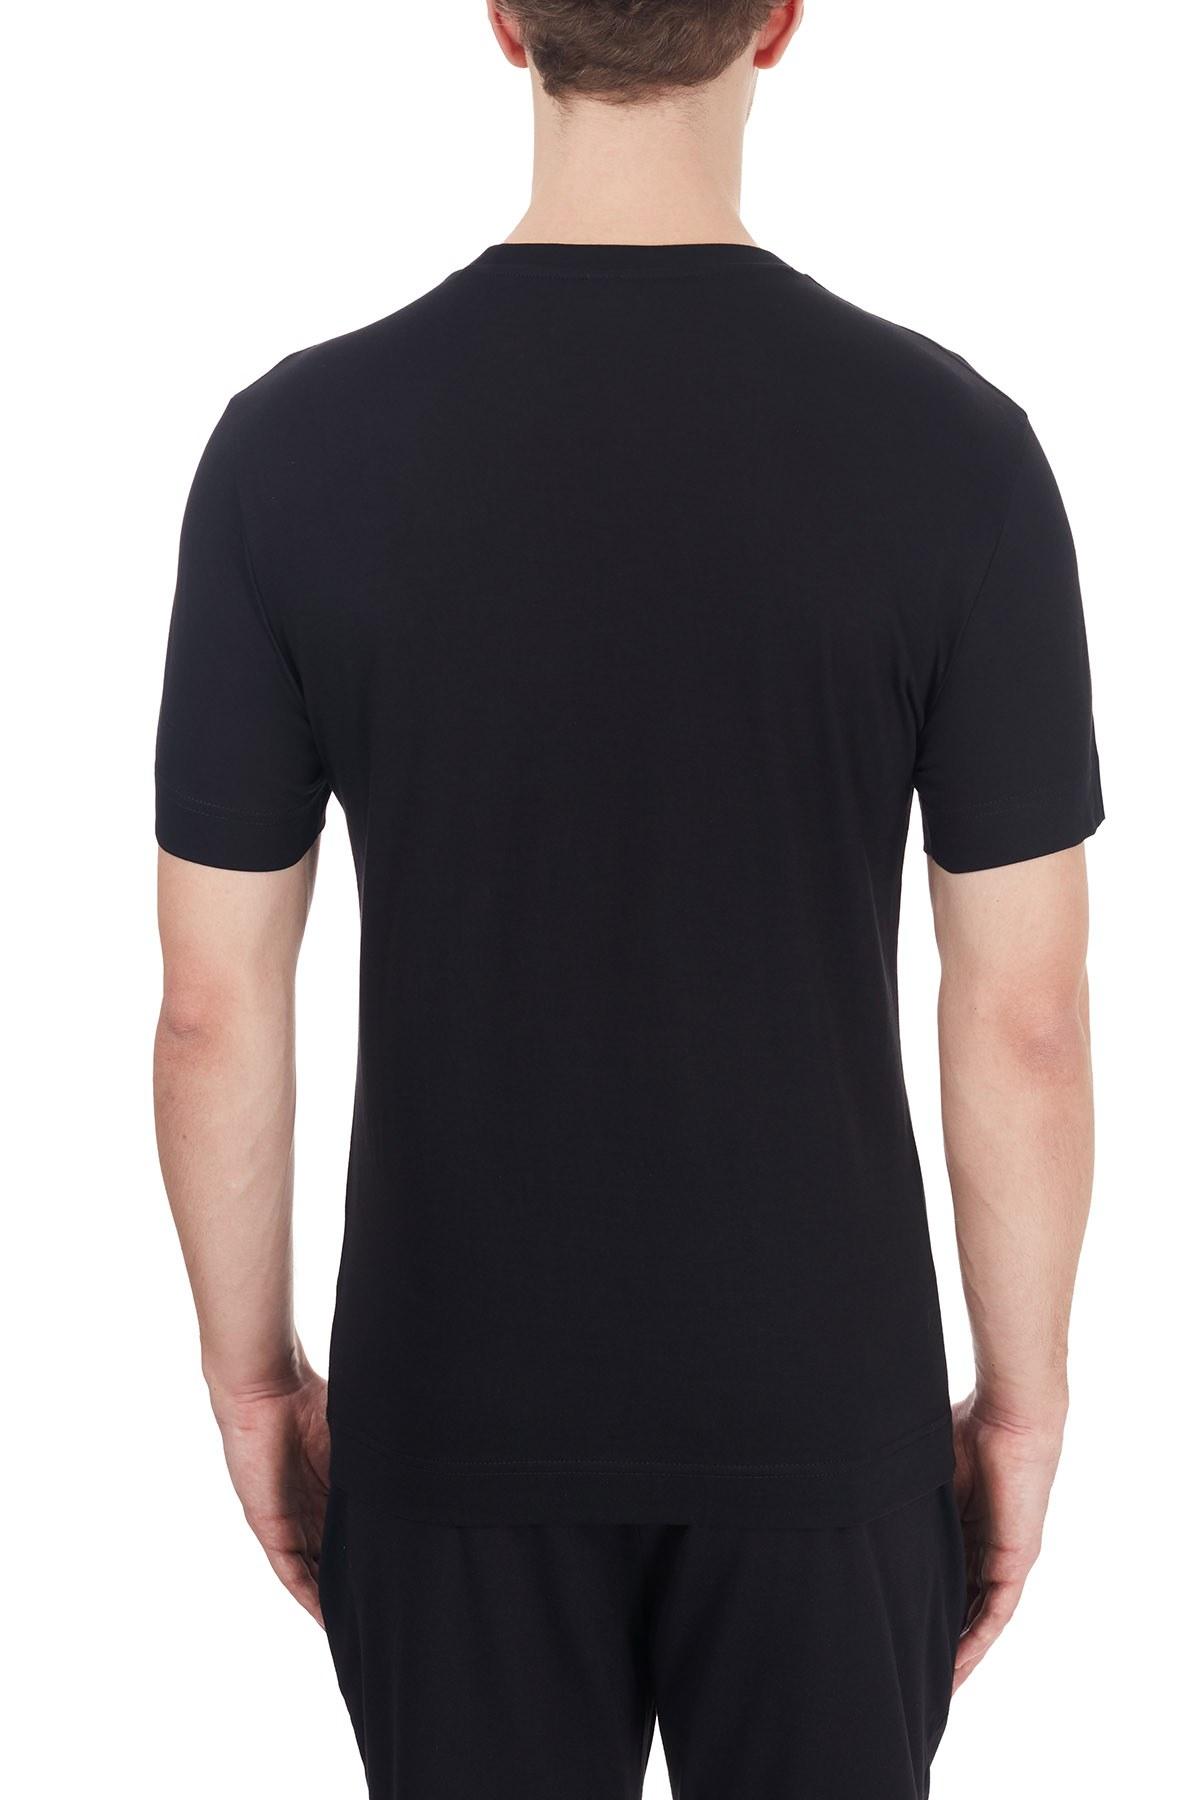 Emporio Armani Logo Baskılı Bisiklet Yaka % 100 Pamuk Erkek T Shirt 6H1T6G 1JSHZ 0002 SİYAH